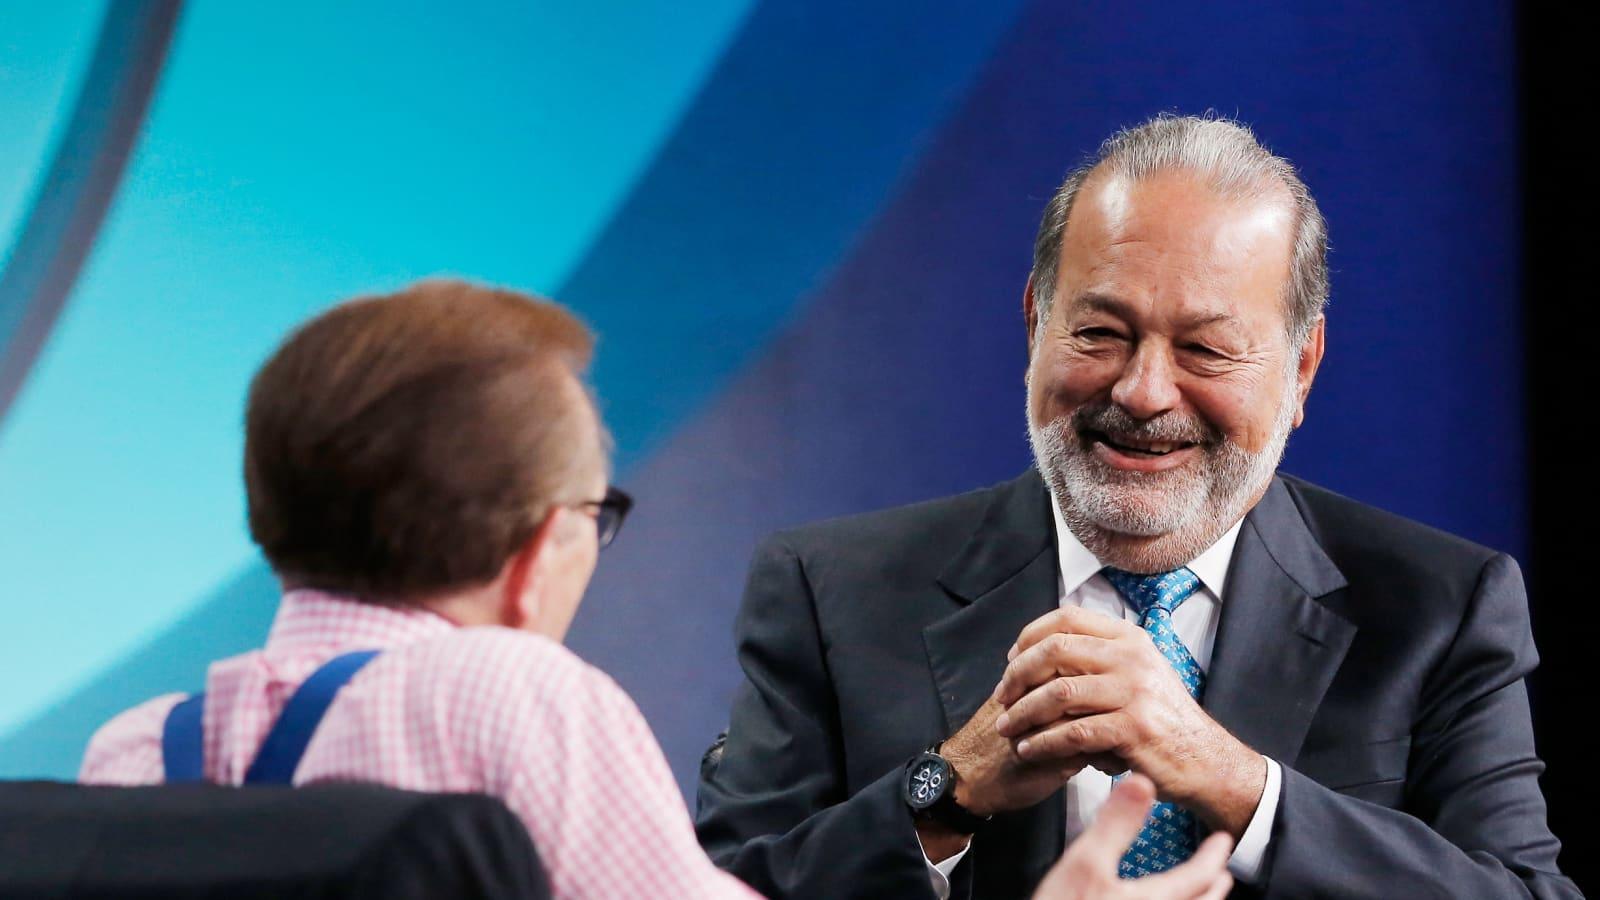 Carlos slim investment holdings transalta dividend reinvestment plan companies